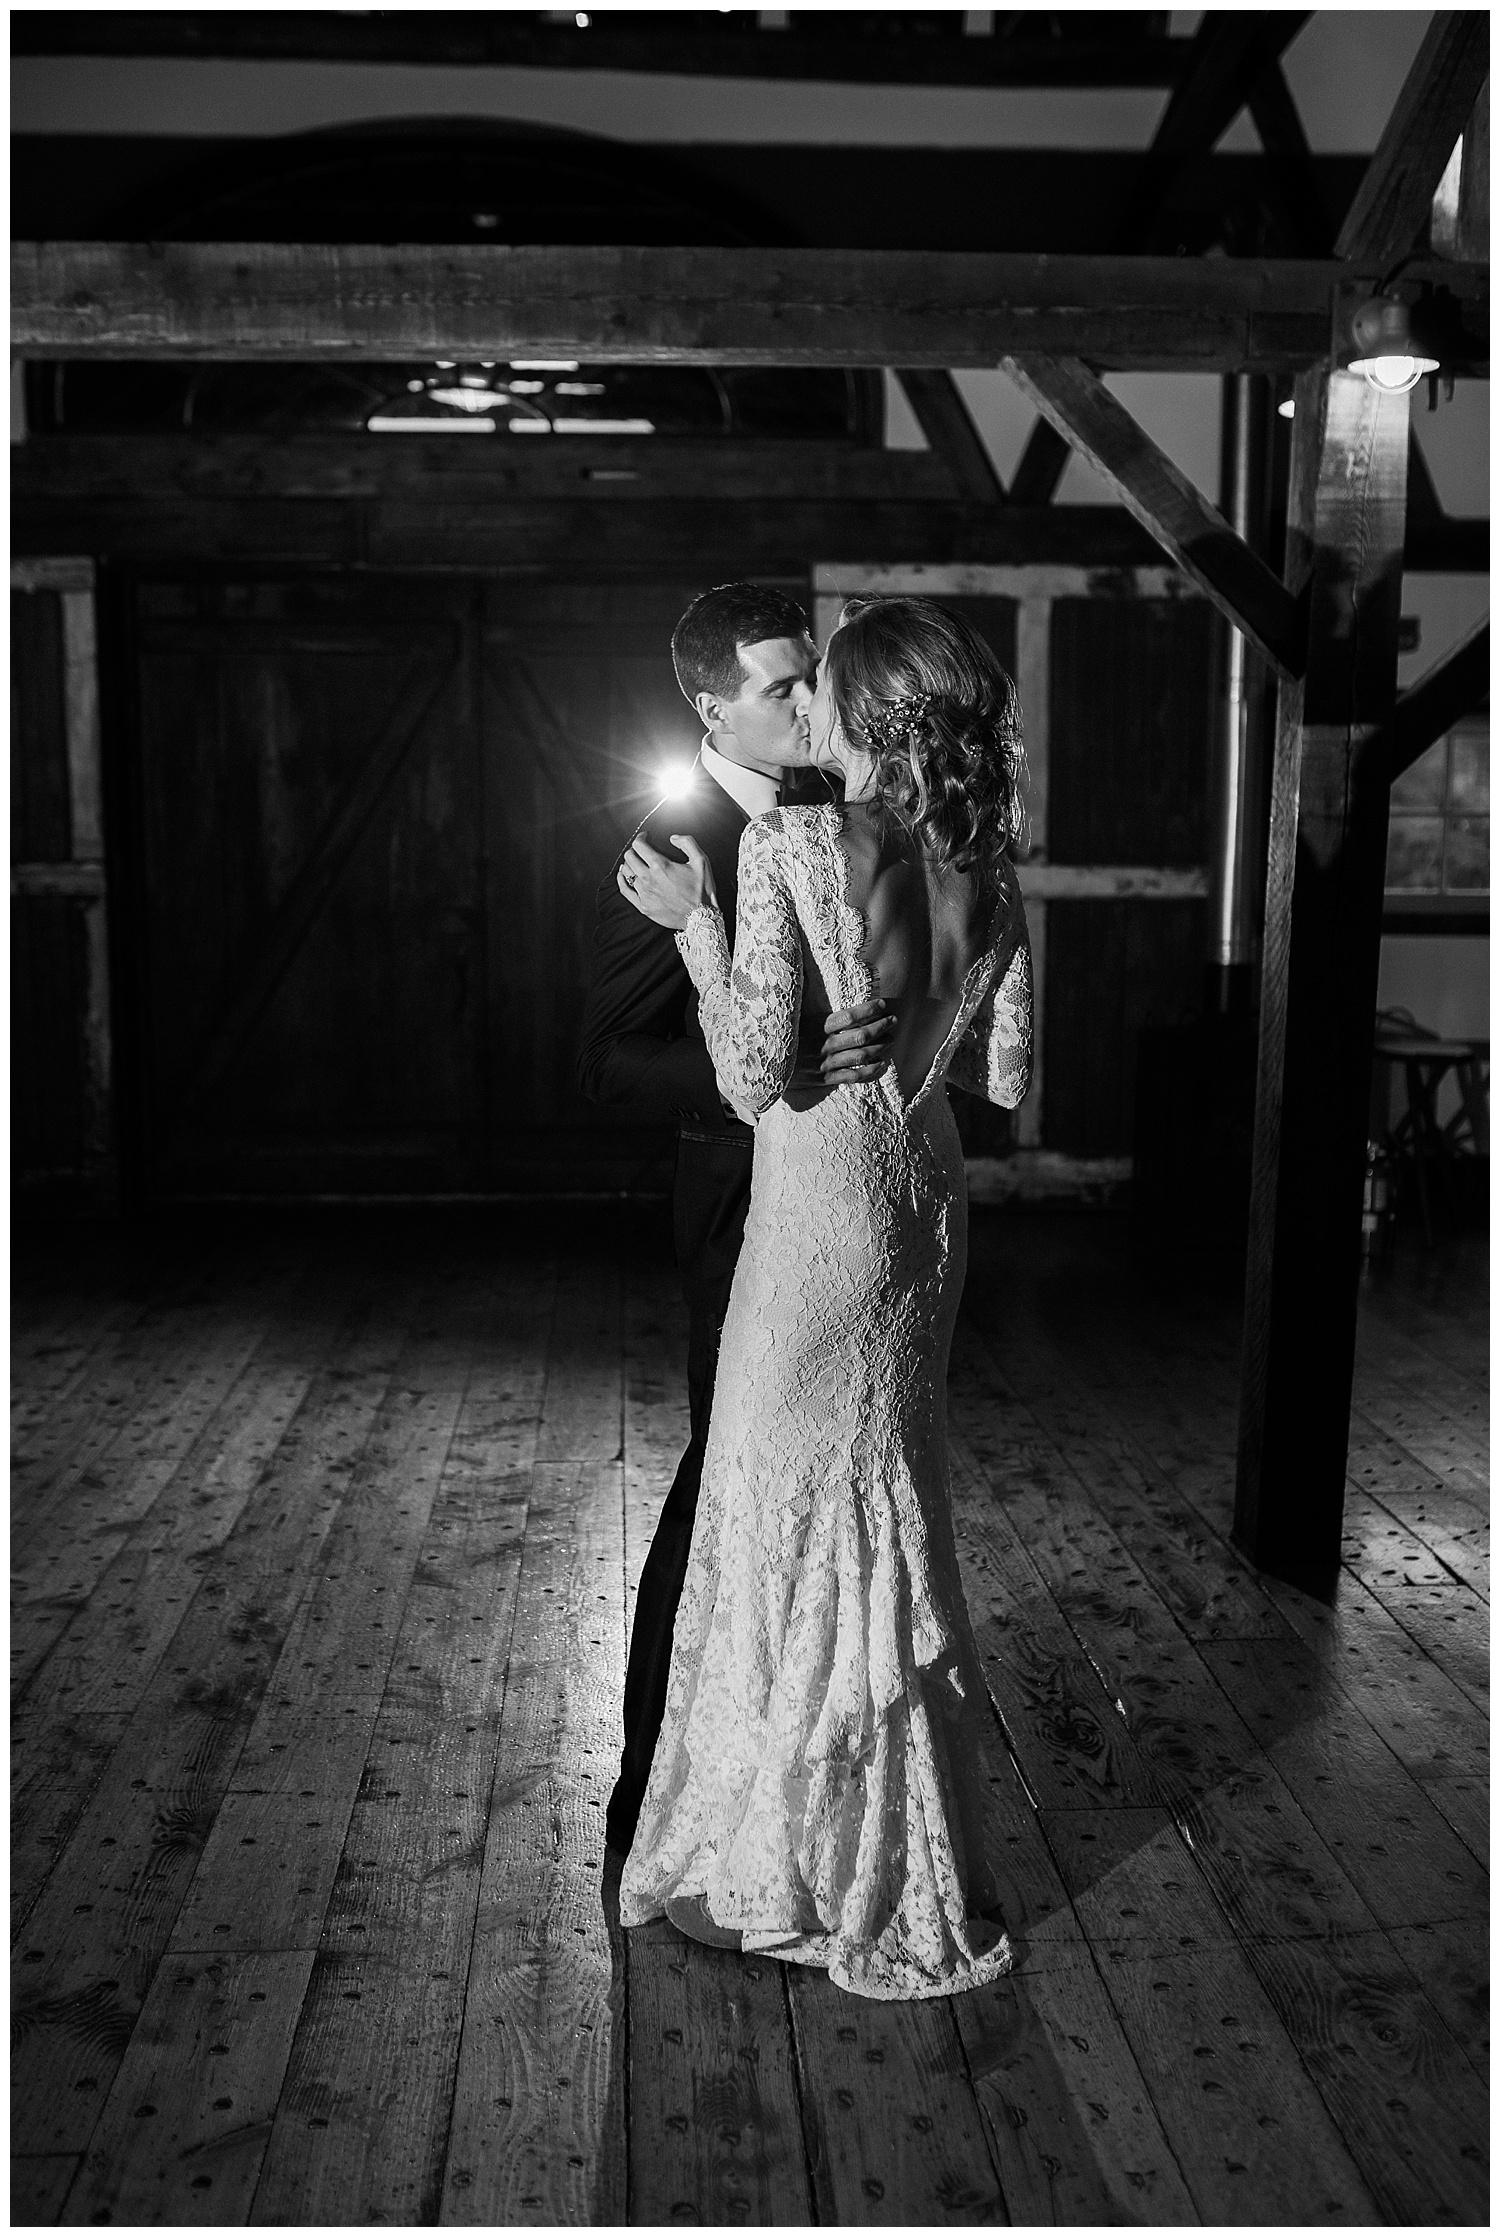 First dance wedding photo